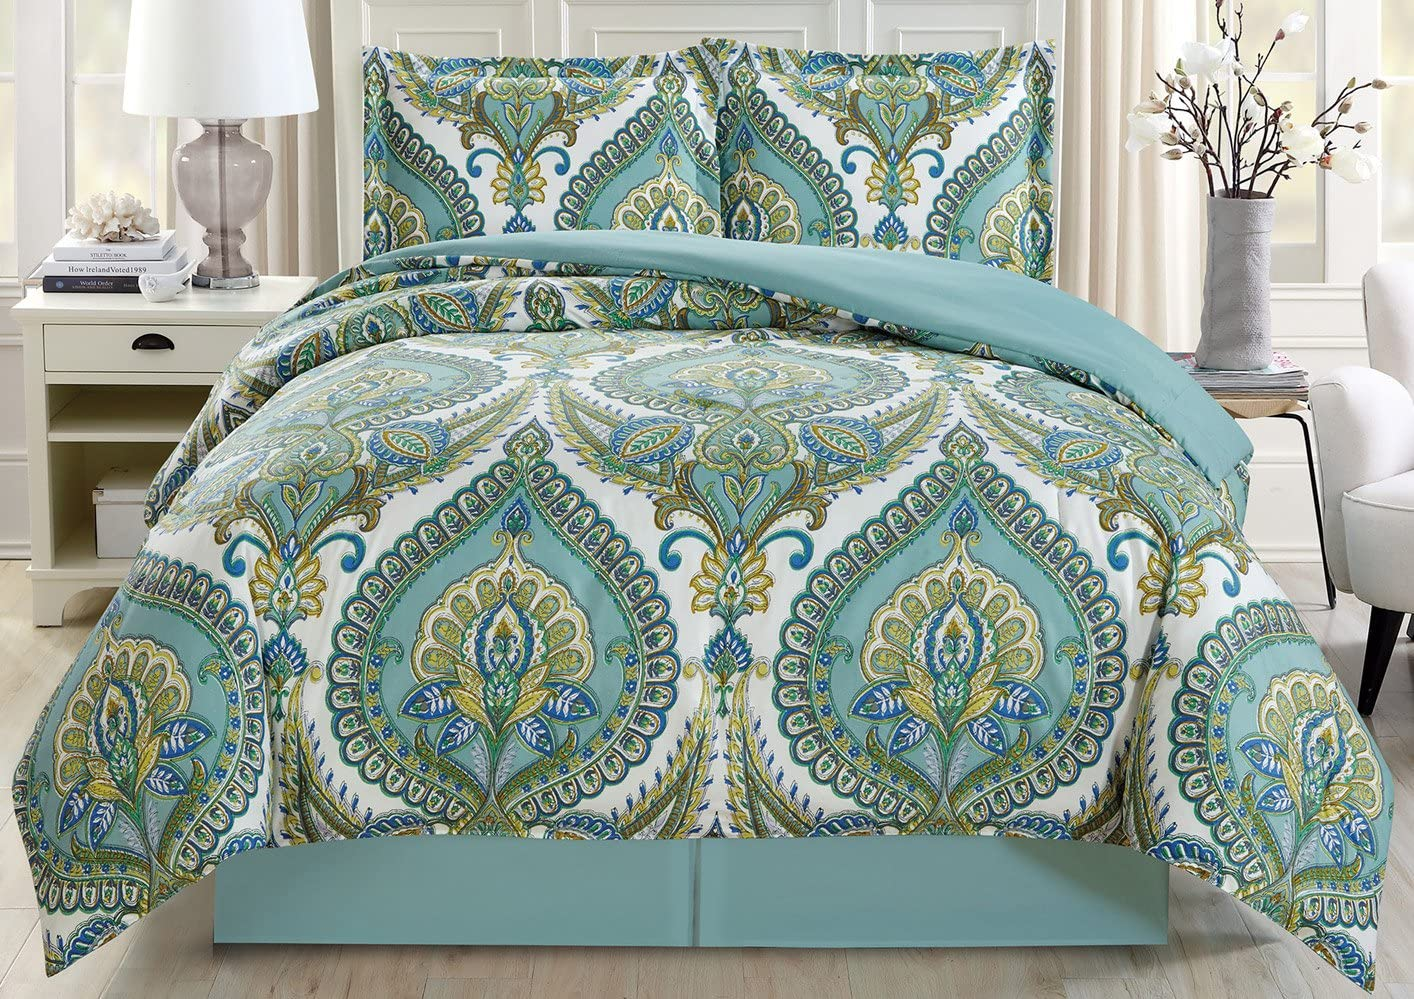 4-Piece Fine Printed Oversize Comforter Set Reversible Goose